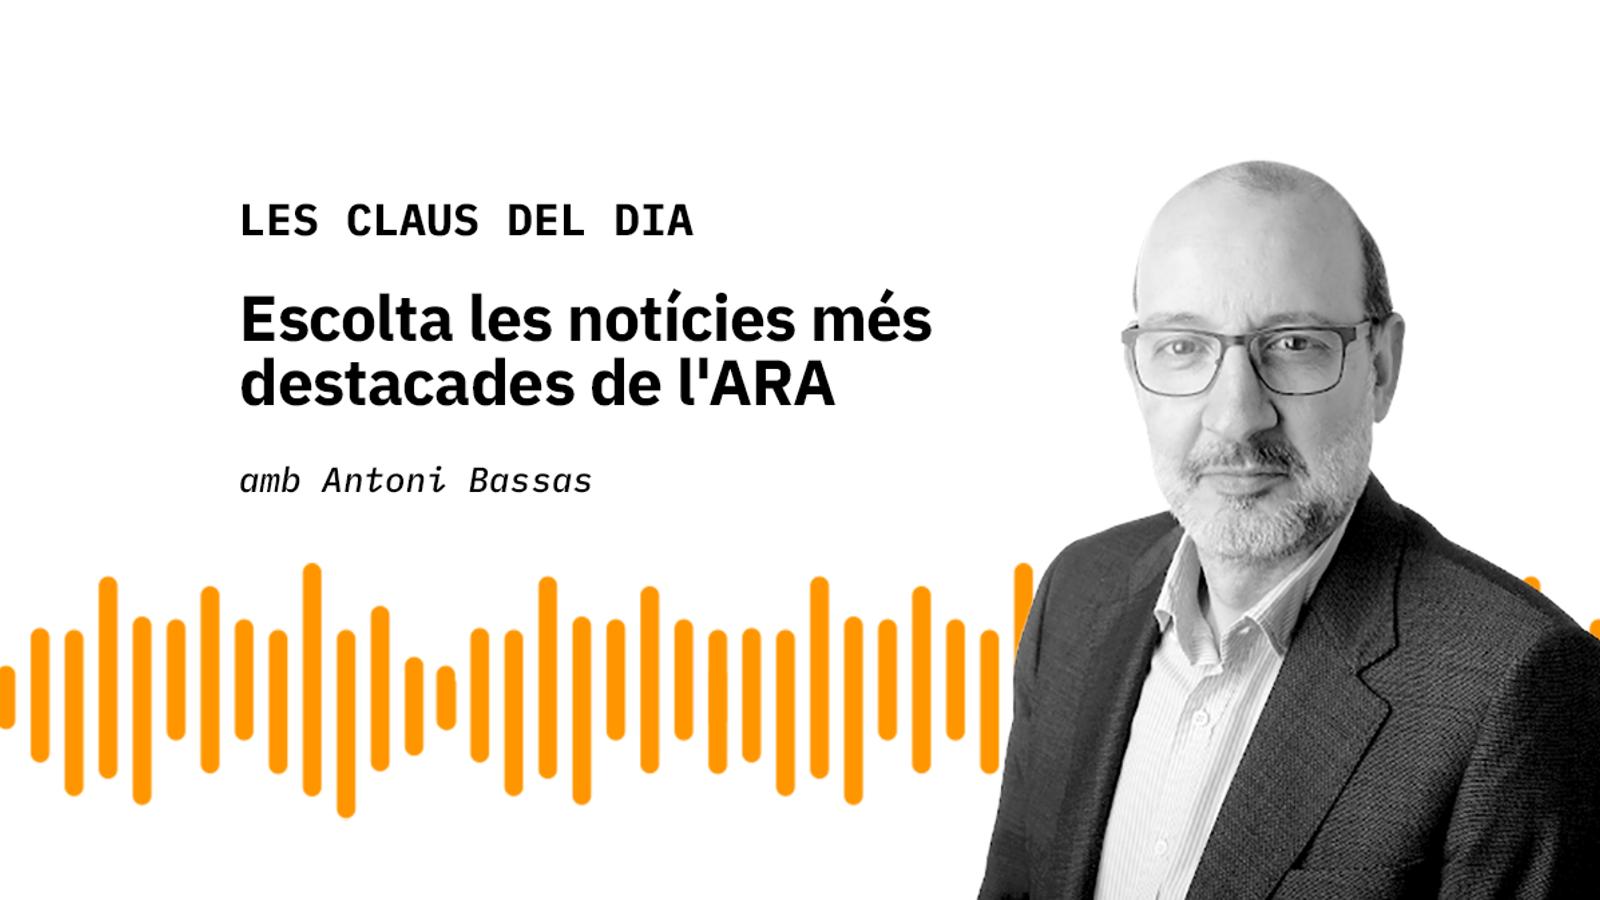 Les claus del dia, per Antoni Bassas (14/02/2019)